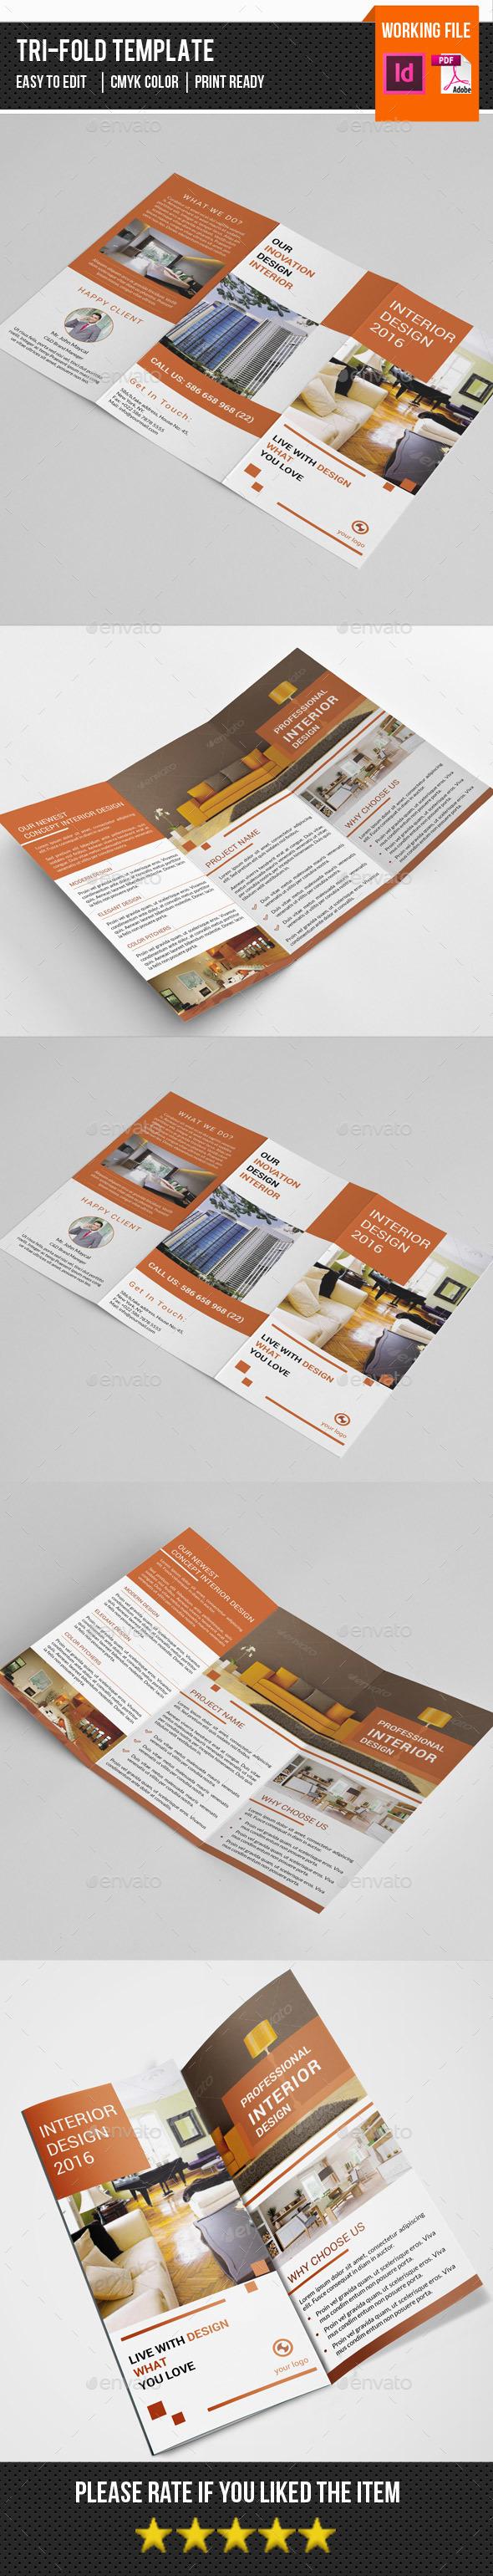 Interior Design Trifold Brochure-V267 - Corporate Brochures